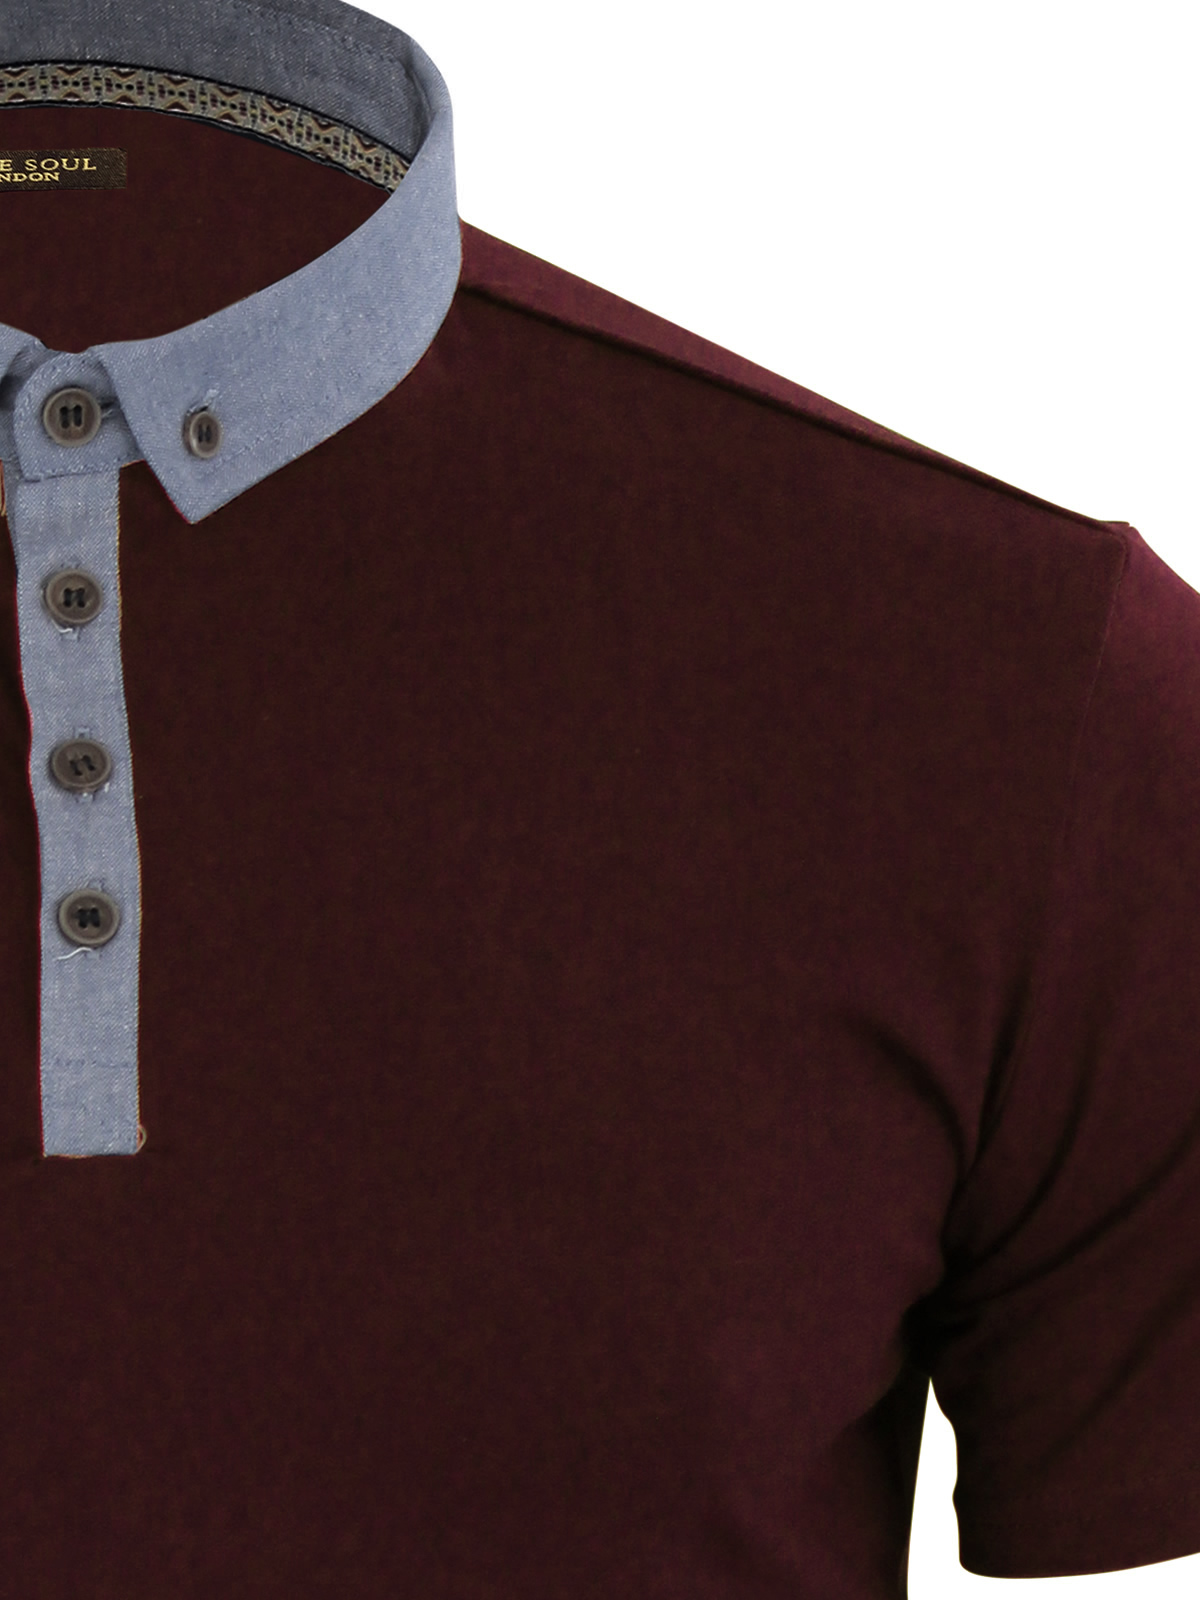 Mens-Polo-T-Shirt-Brave-Soul-Chimera-Chambray-Collared-Cotton-Casual-Top thumbnail 4